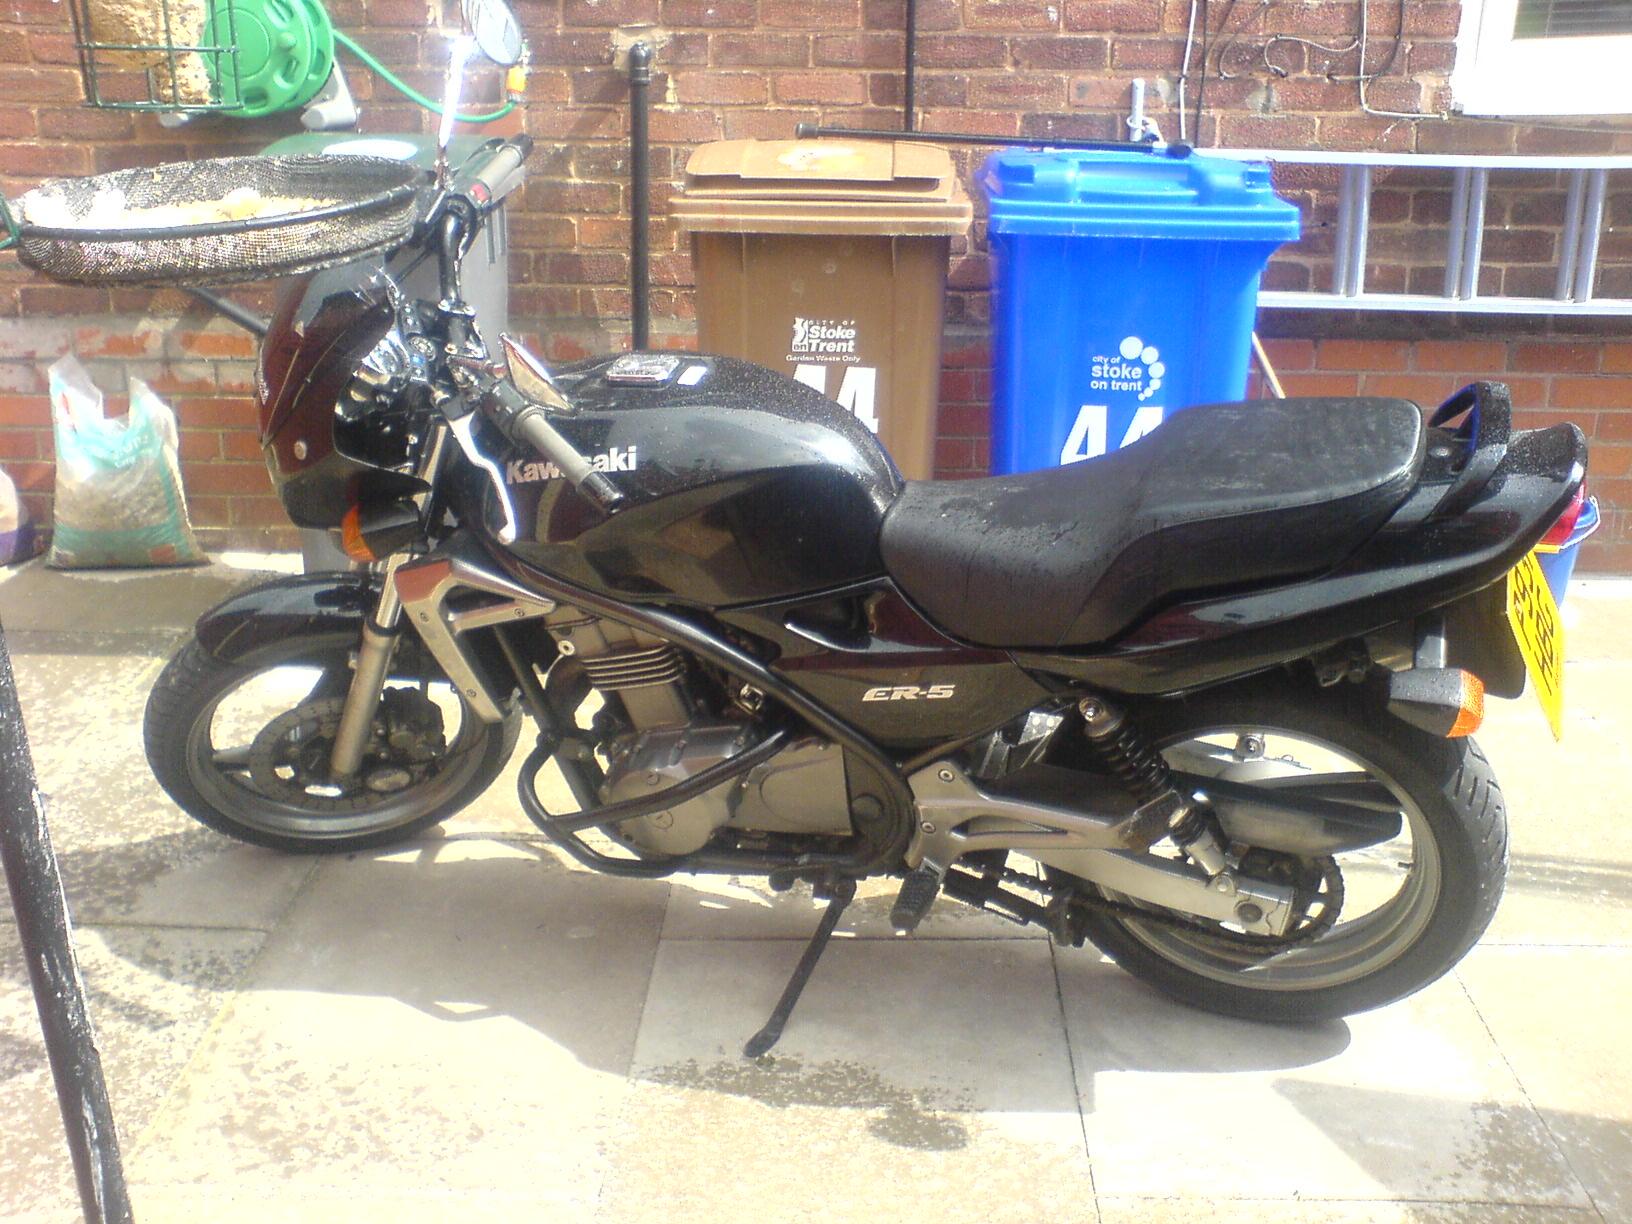 The Kawasaki 500 At Motorbikespecsnet The Motorcycle Specification